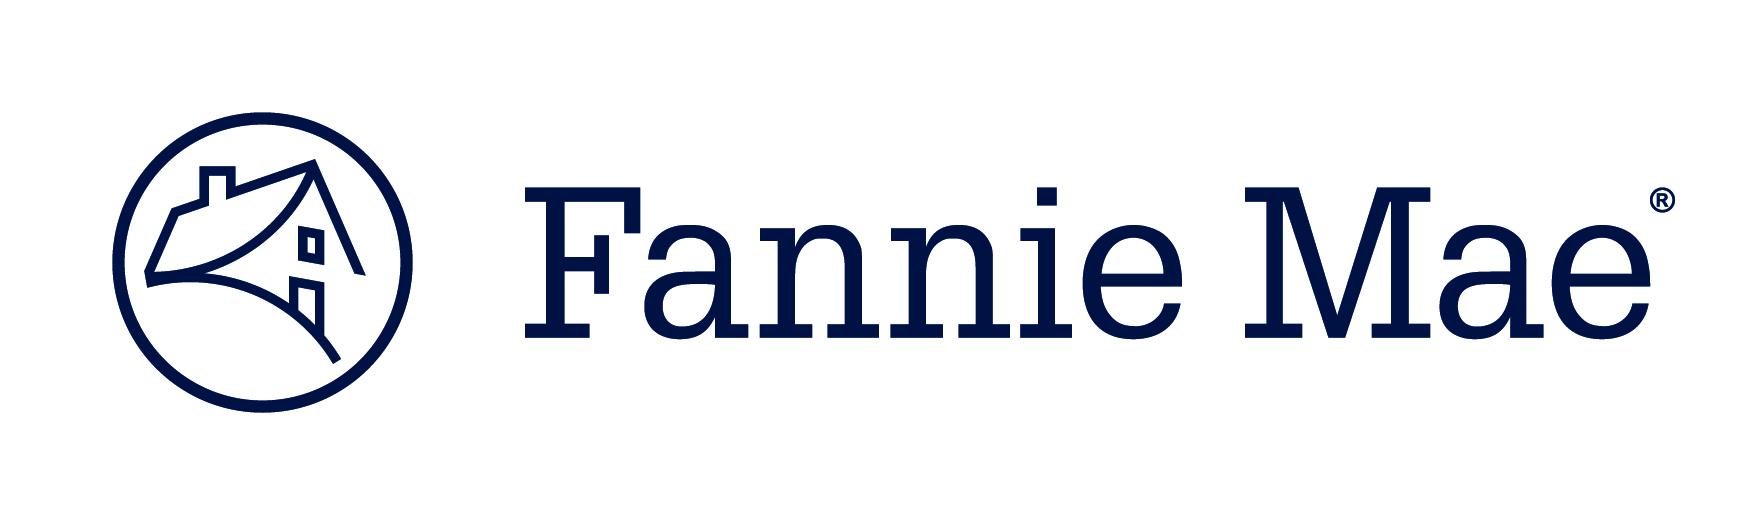 fm_logo_4cp_nvy_c_r